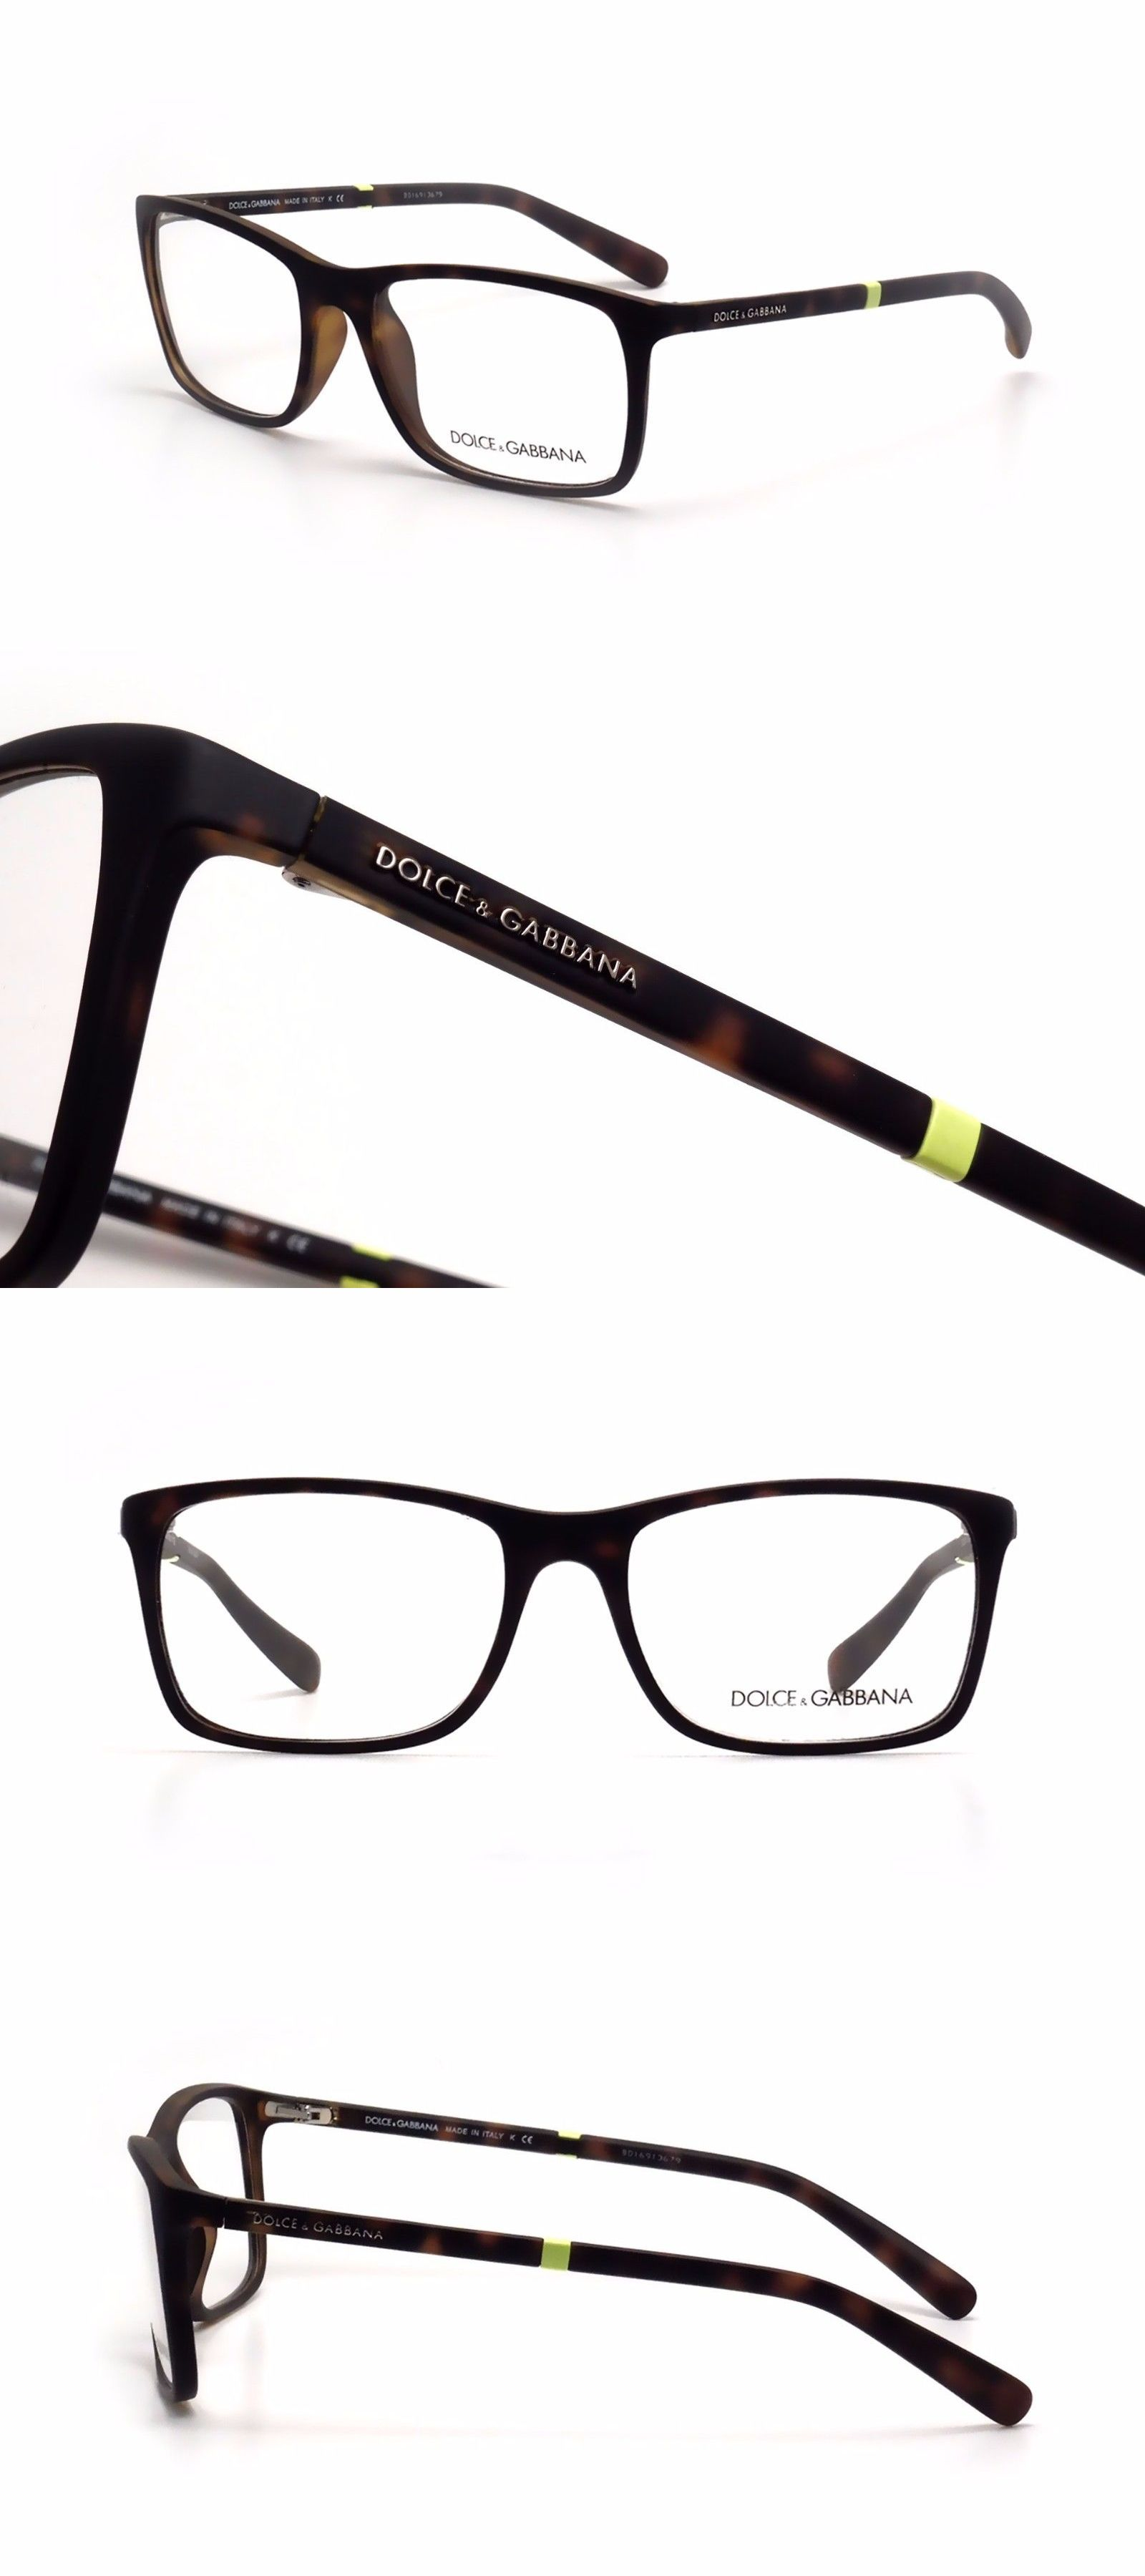 Fashion Eyewear Clear Glasses 179240: $475 Dolce Gabbana Mens Brown ...